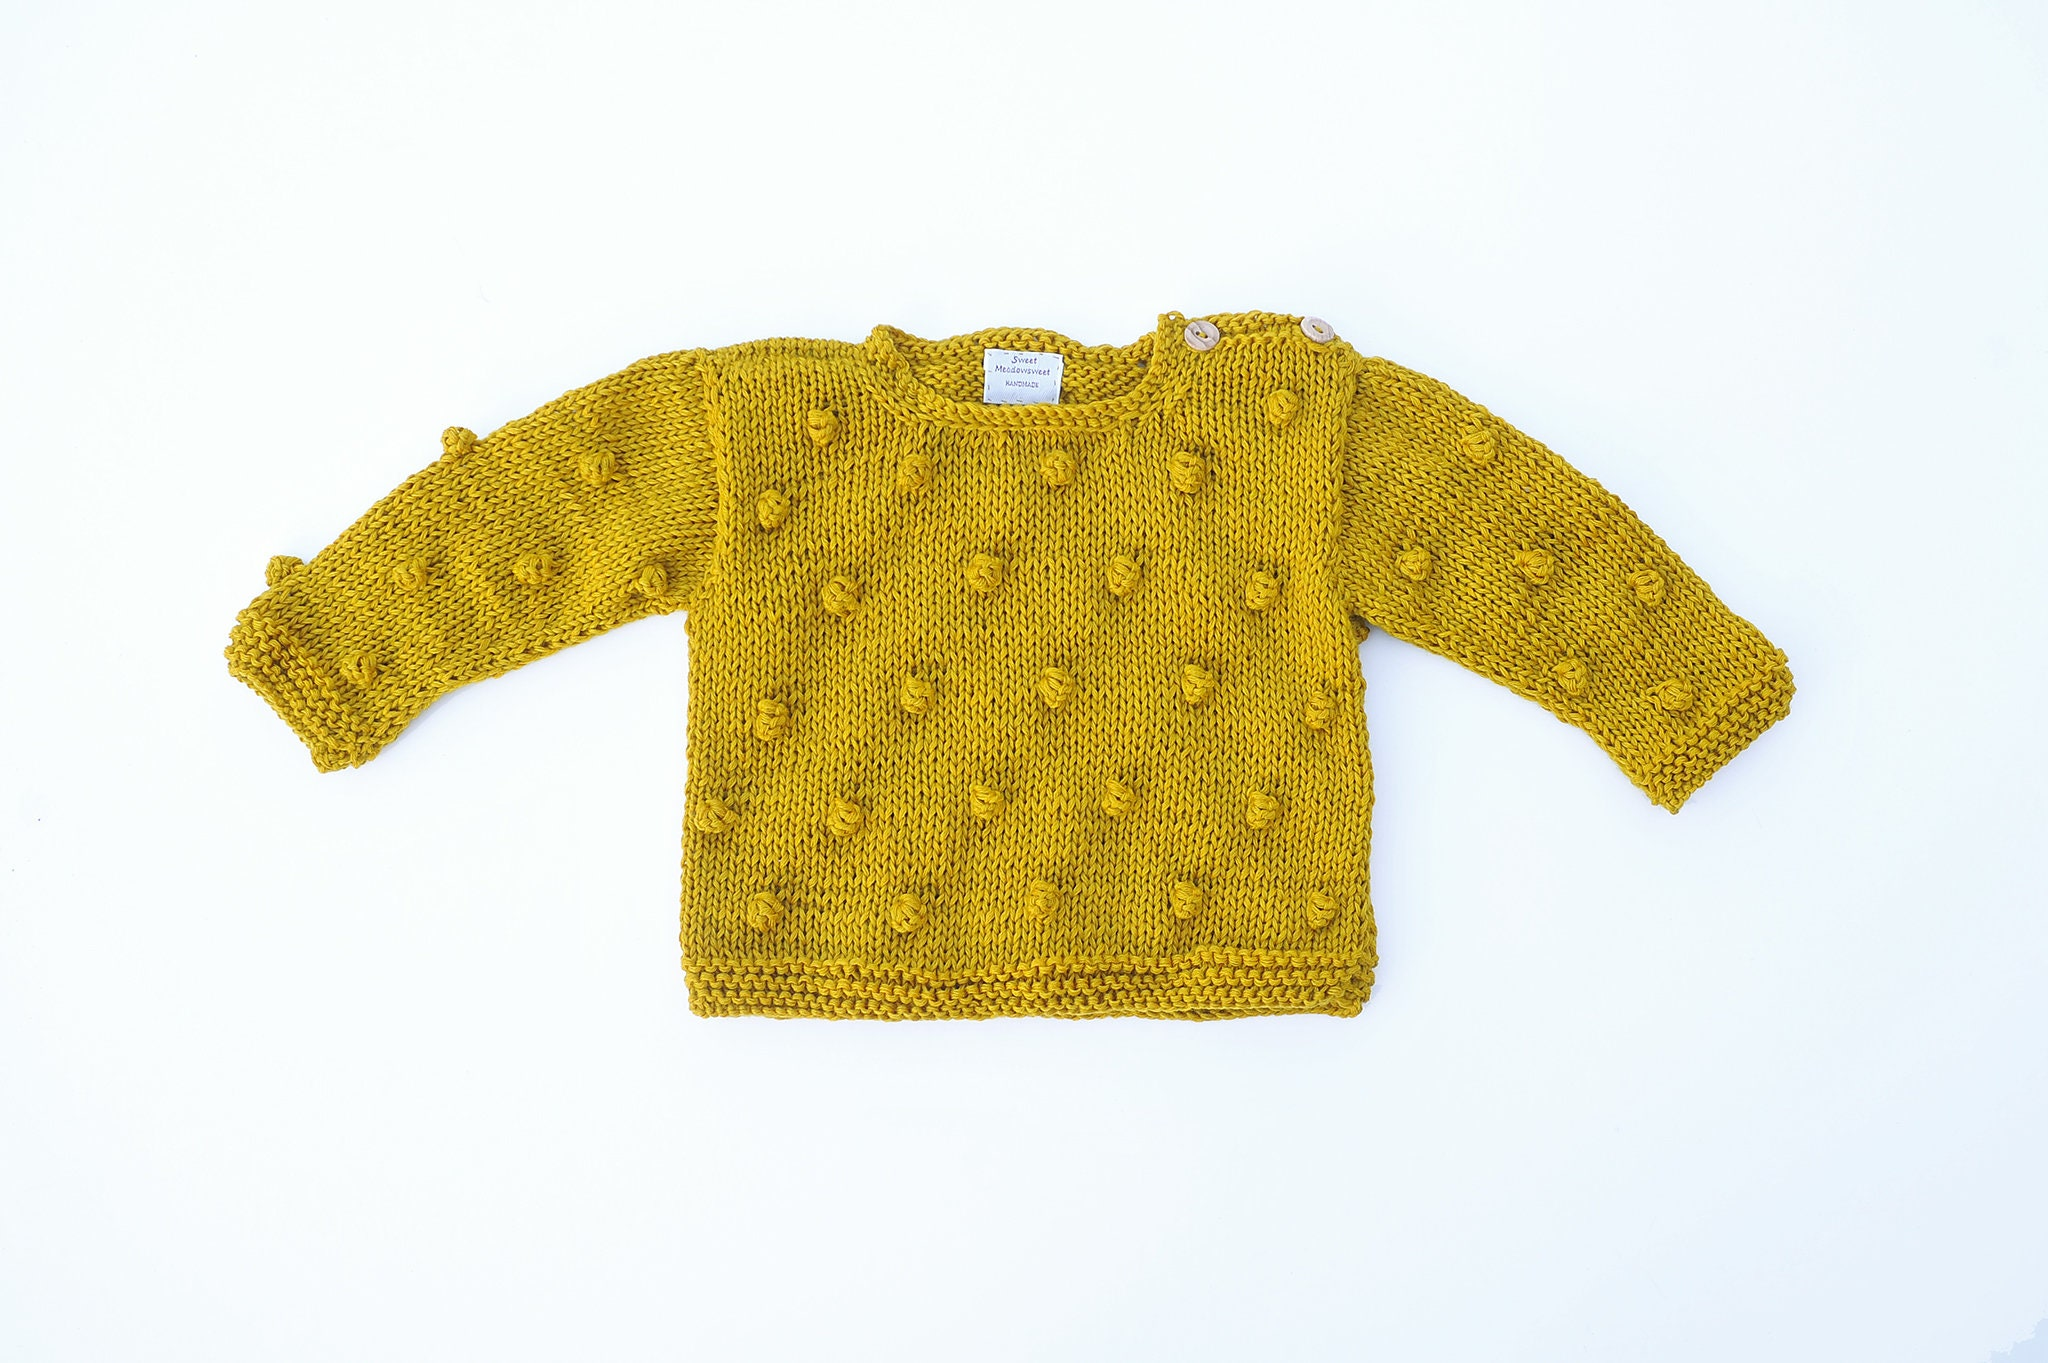 f03cb46350dc Childrens newborn baby toddler girls boys hand knitted Sweater